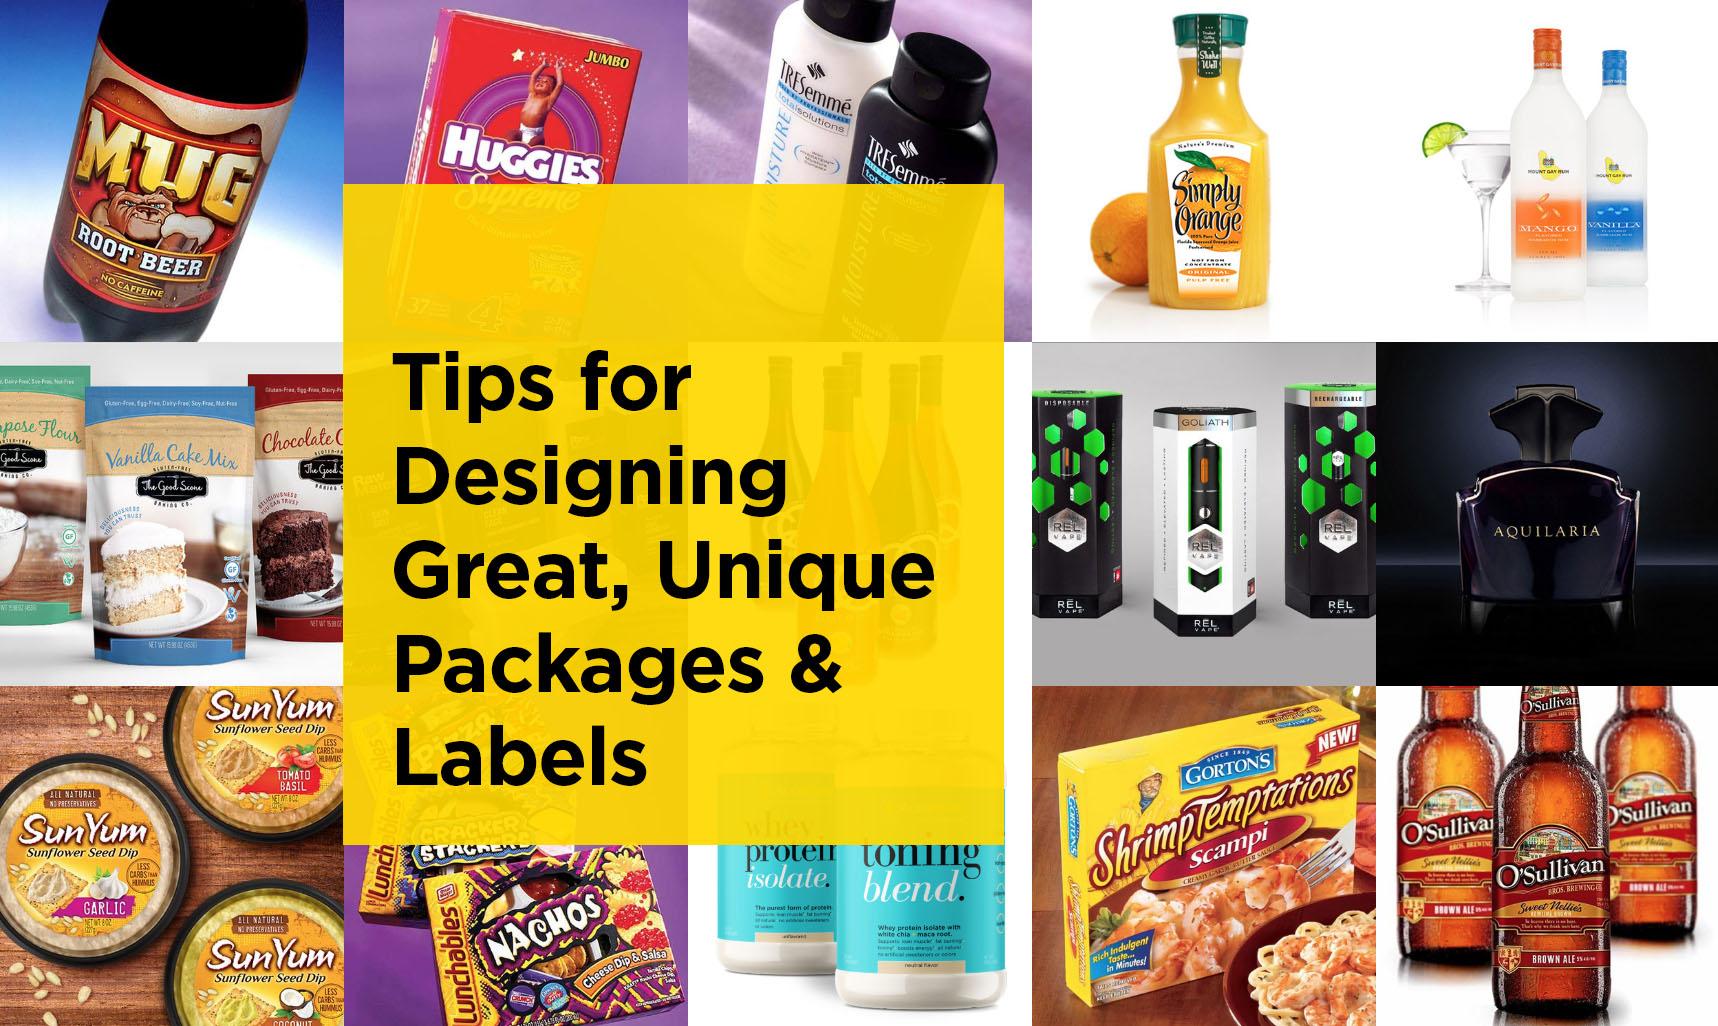 how-to-create-great-modern-packaging-designs-san-diego-california-1.jpg